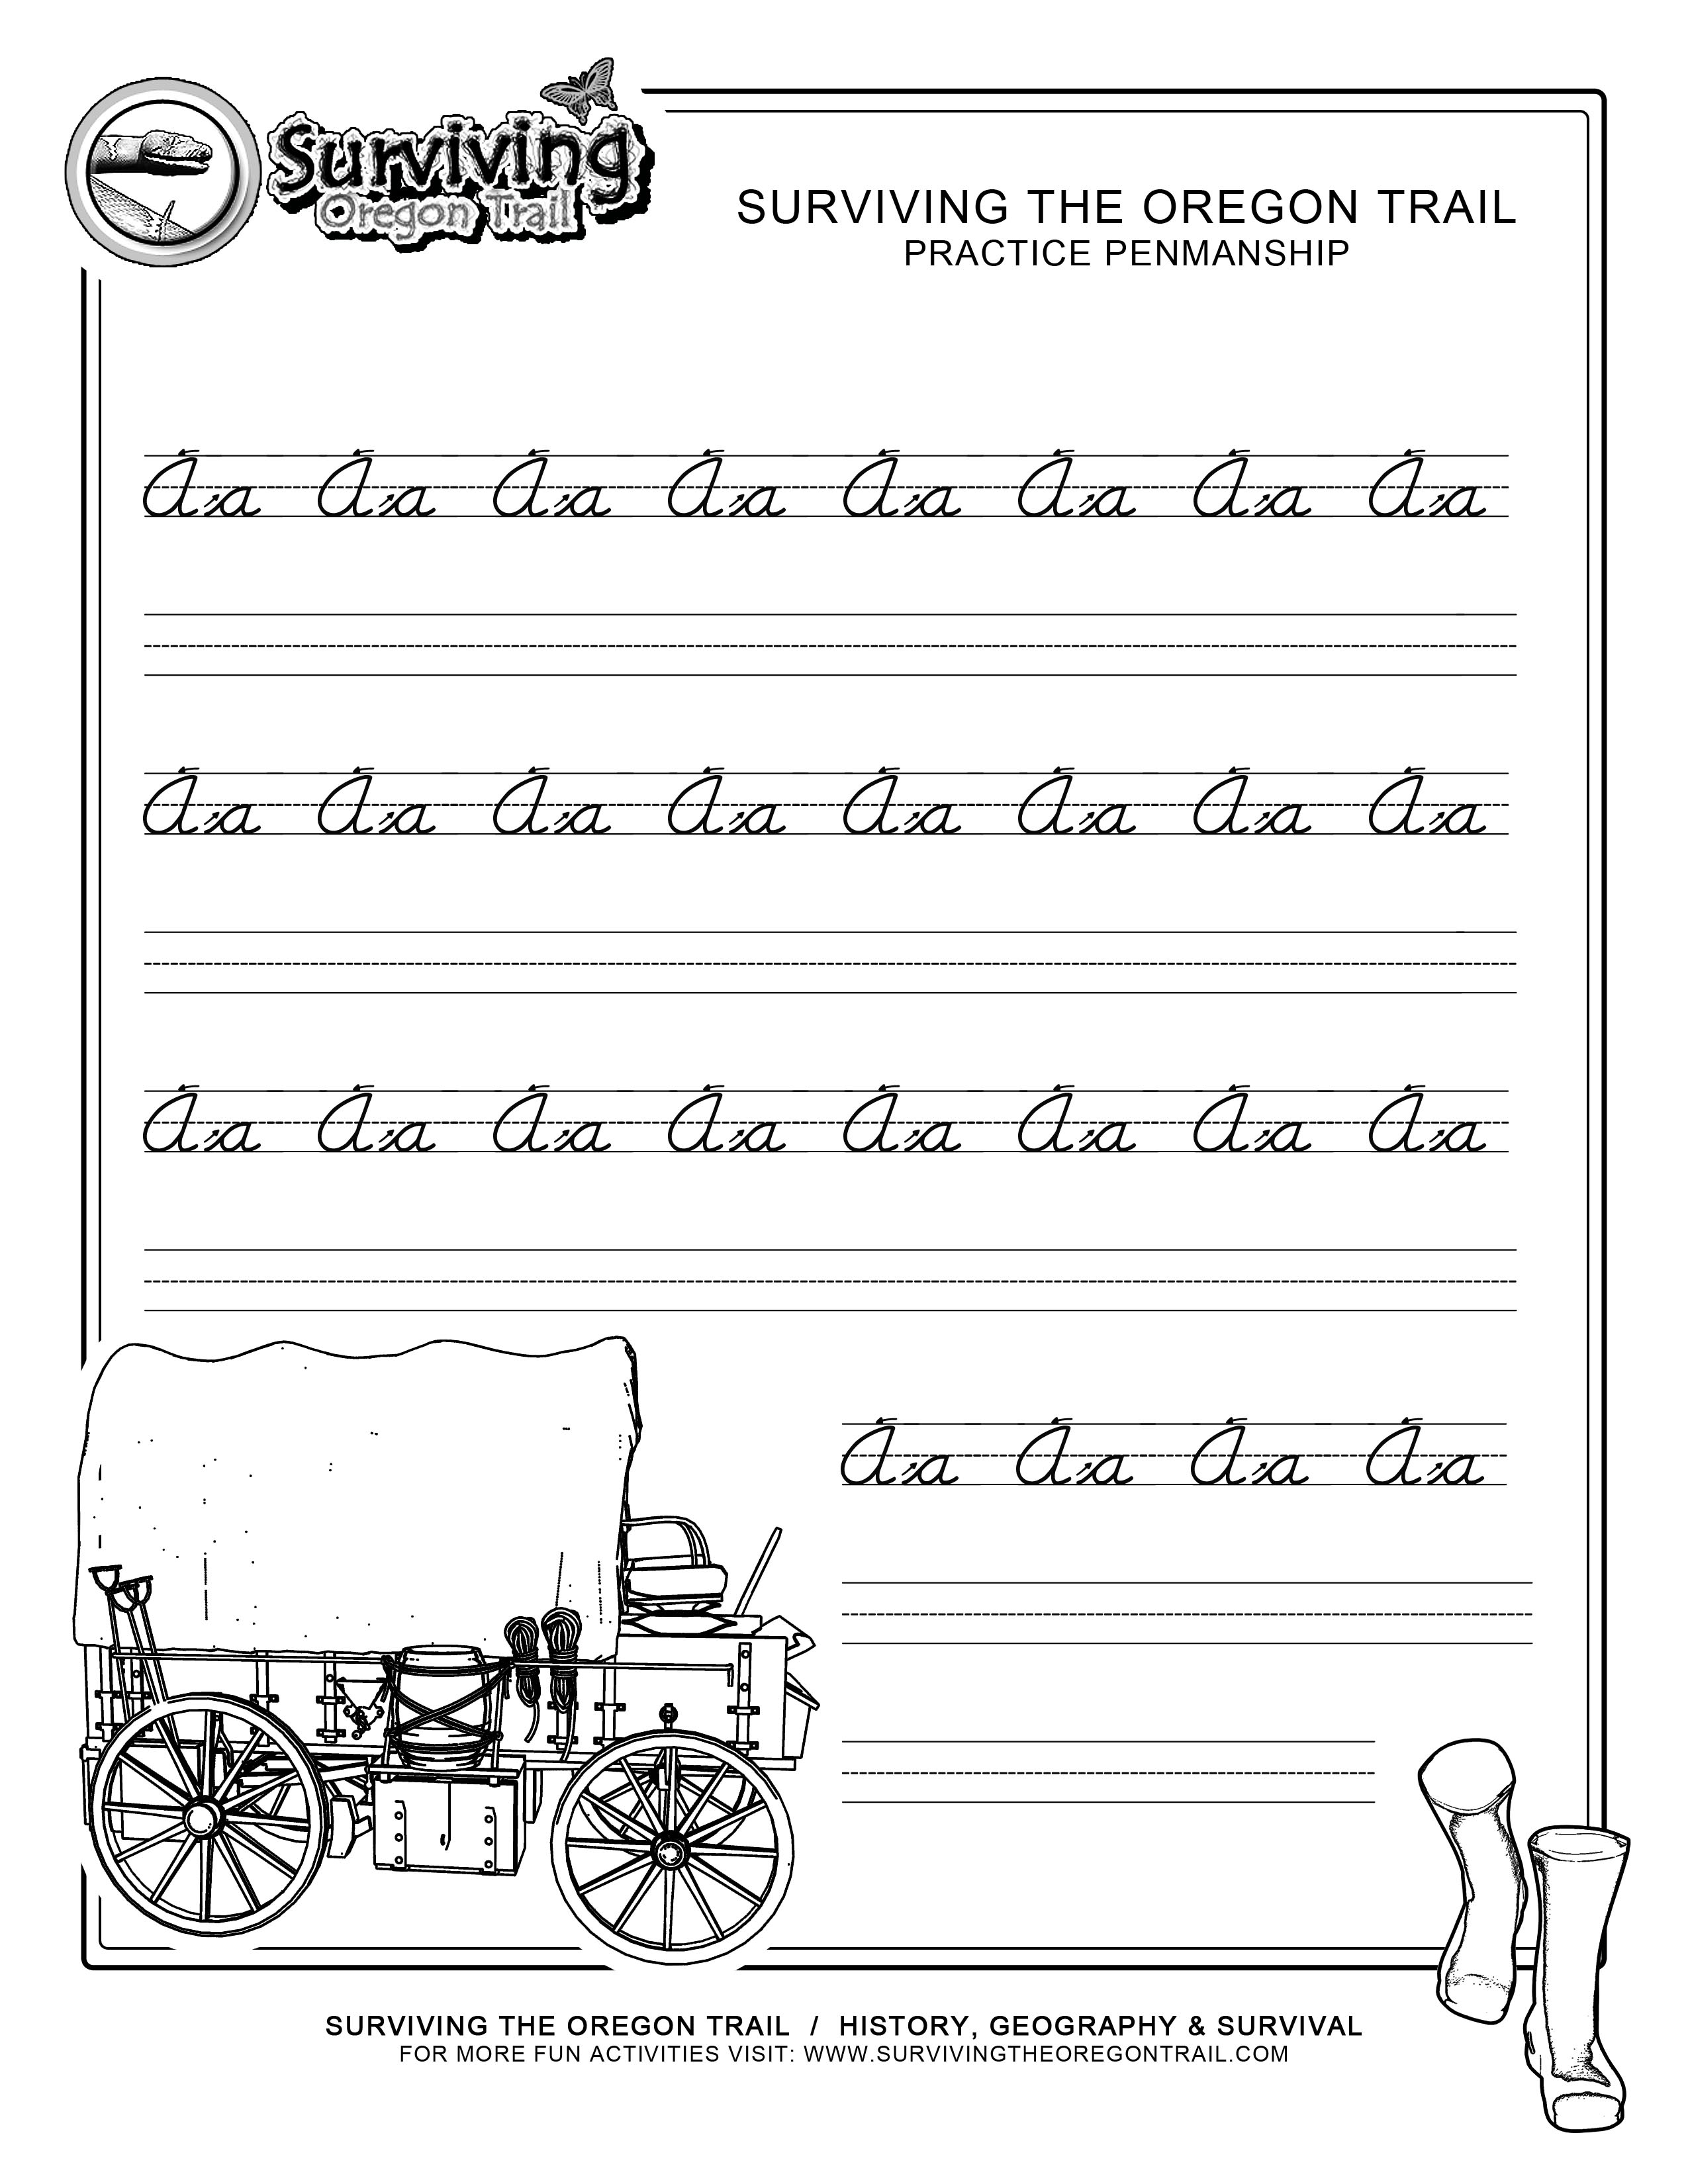 Free Printable Beginner Practice Cursive Worksheet – A A Only - Free Printable Worksheets Handwriting Practice